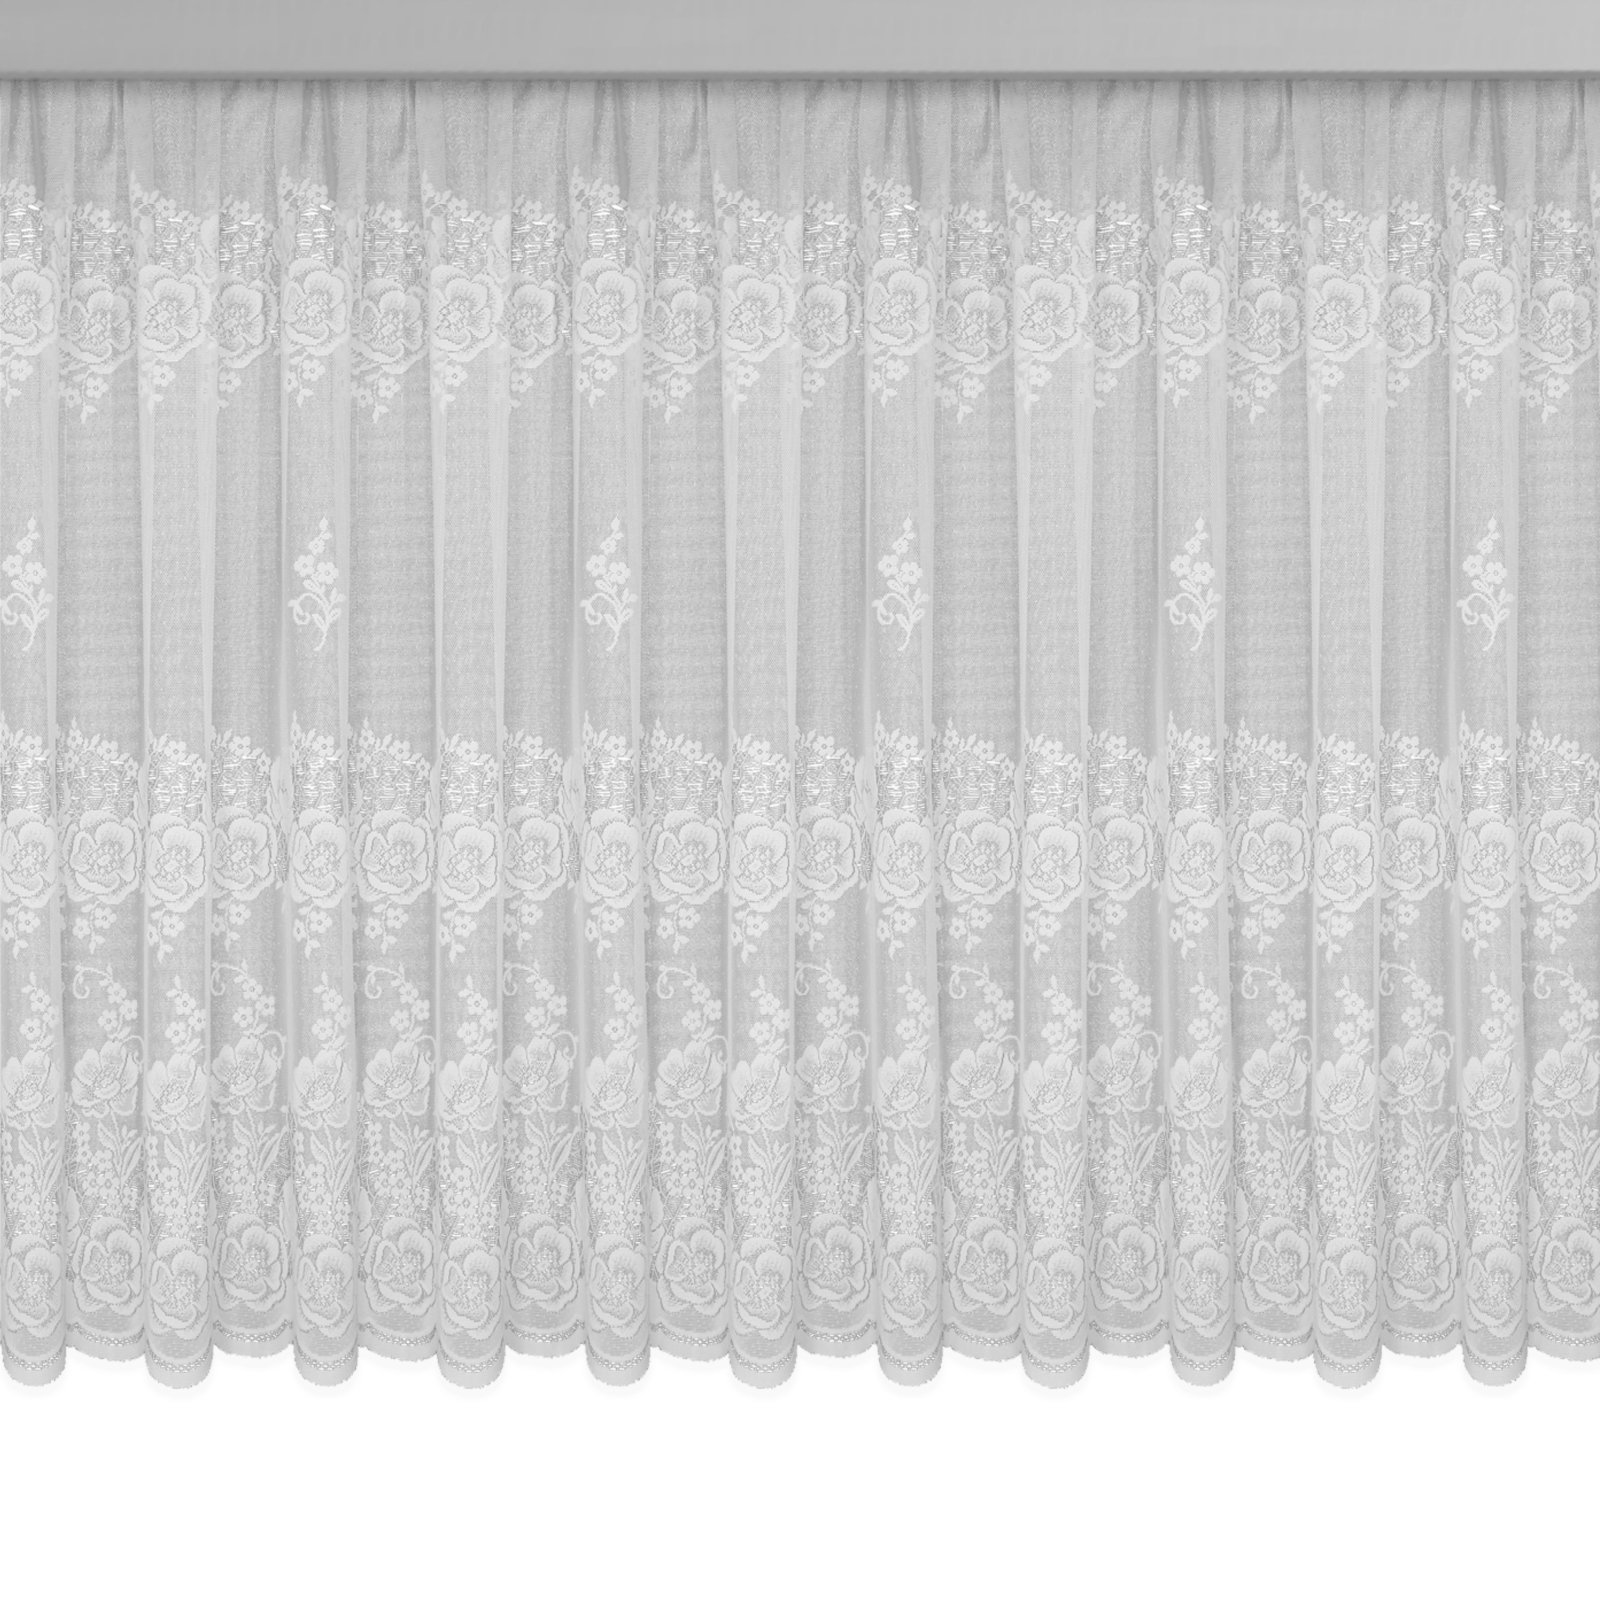 Gardine VERONA - Jaquard-Store - weiß - 450x125 cm